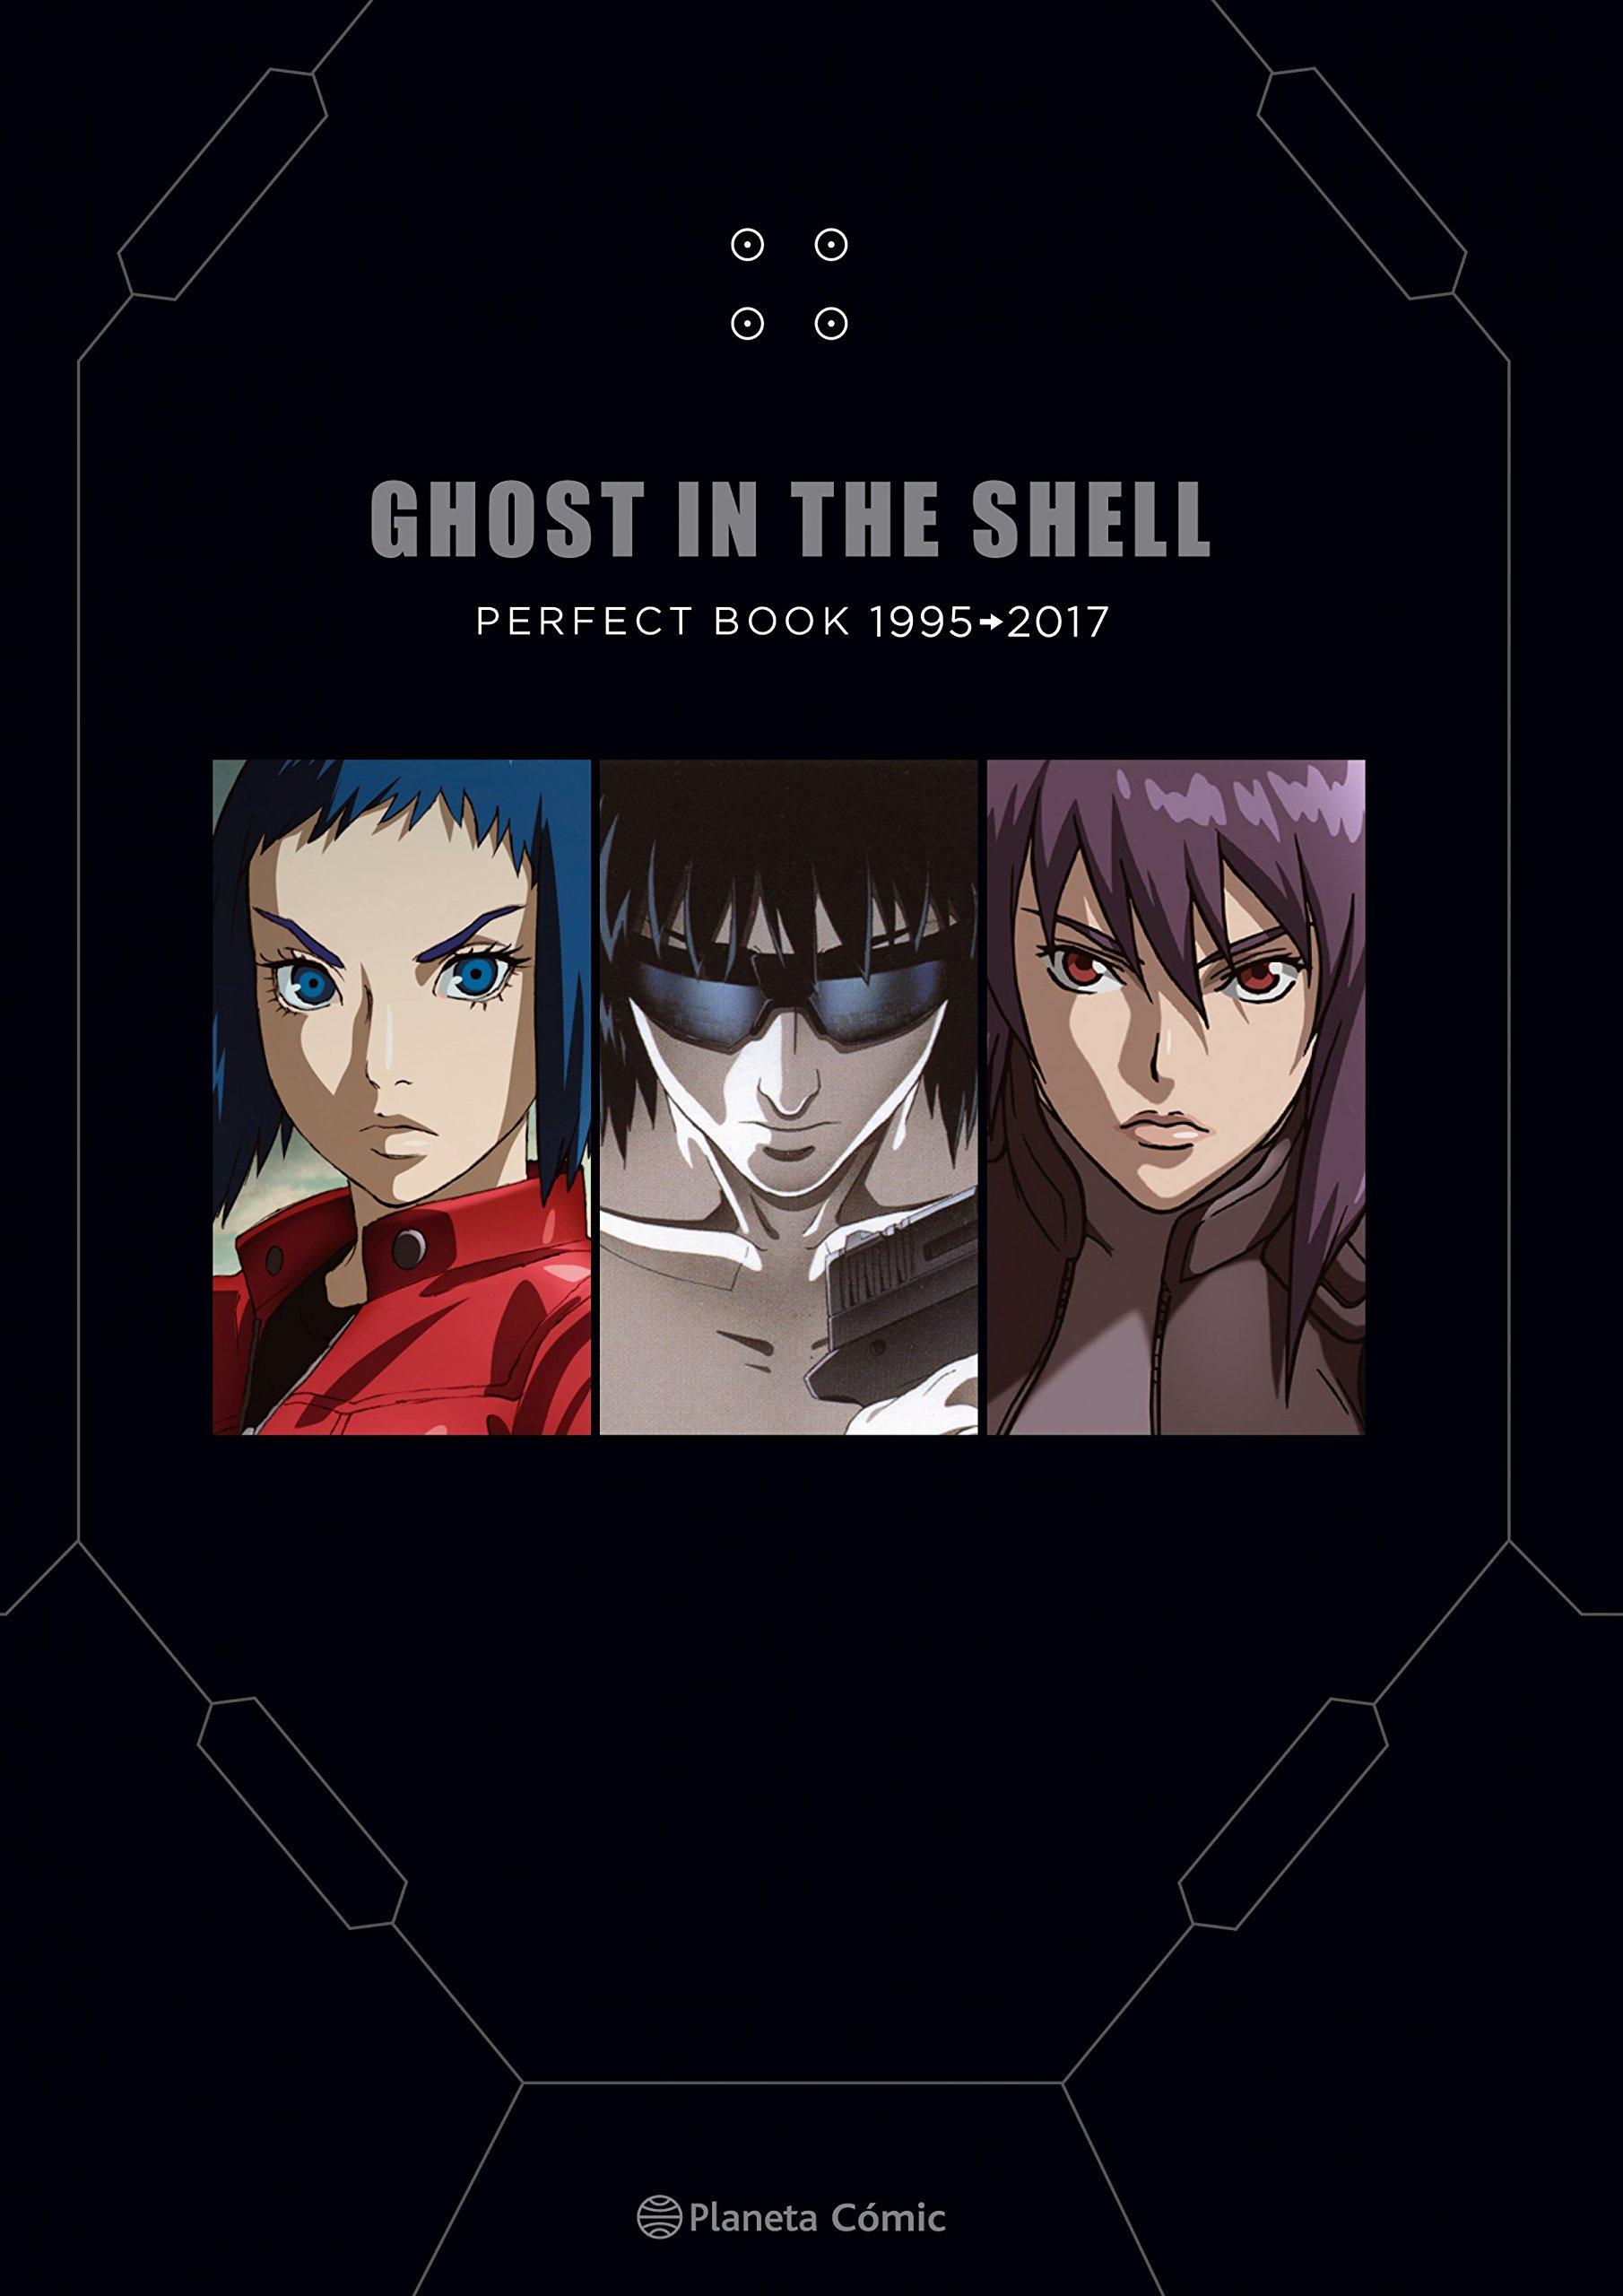 Ghost in the Shell Perfect book 1995-2017 Manga Artbooks: Amazon.es: Masamune, Shirow, Daruma: Libros